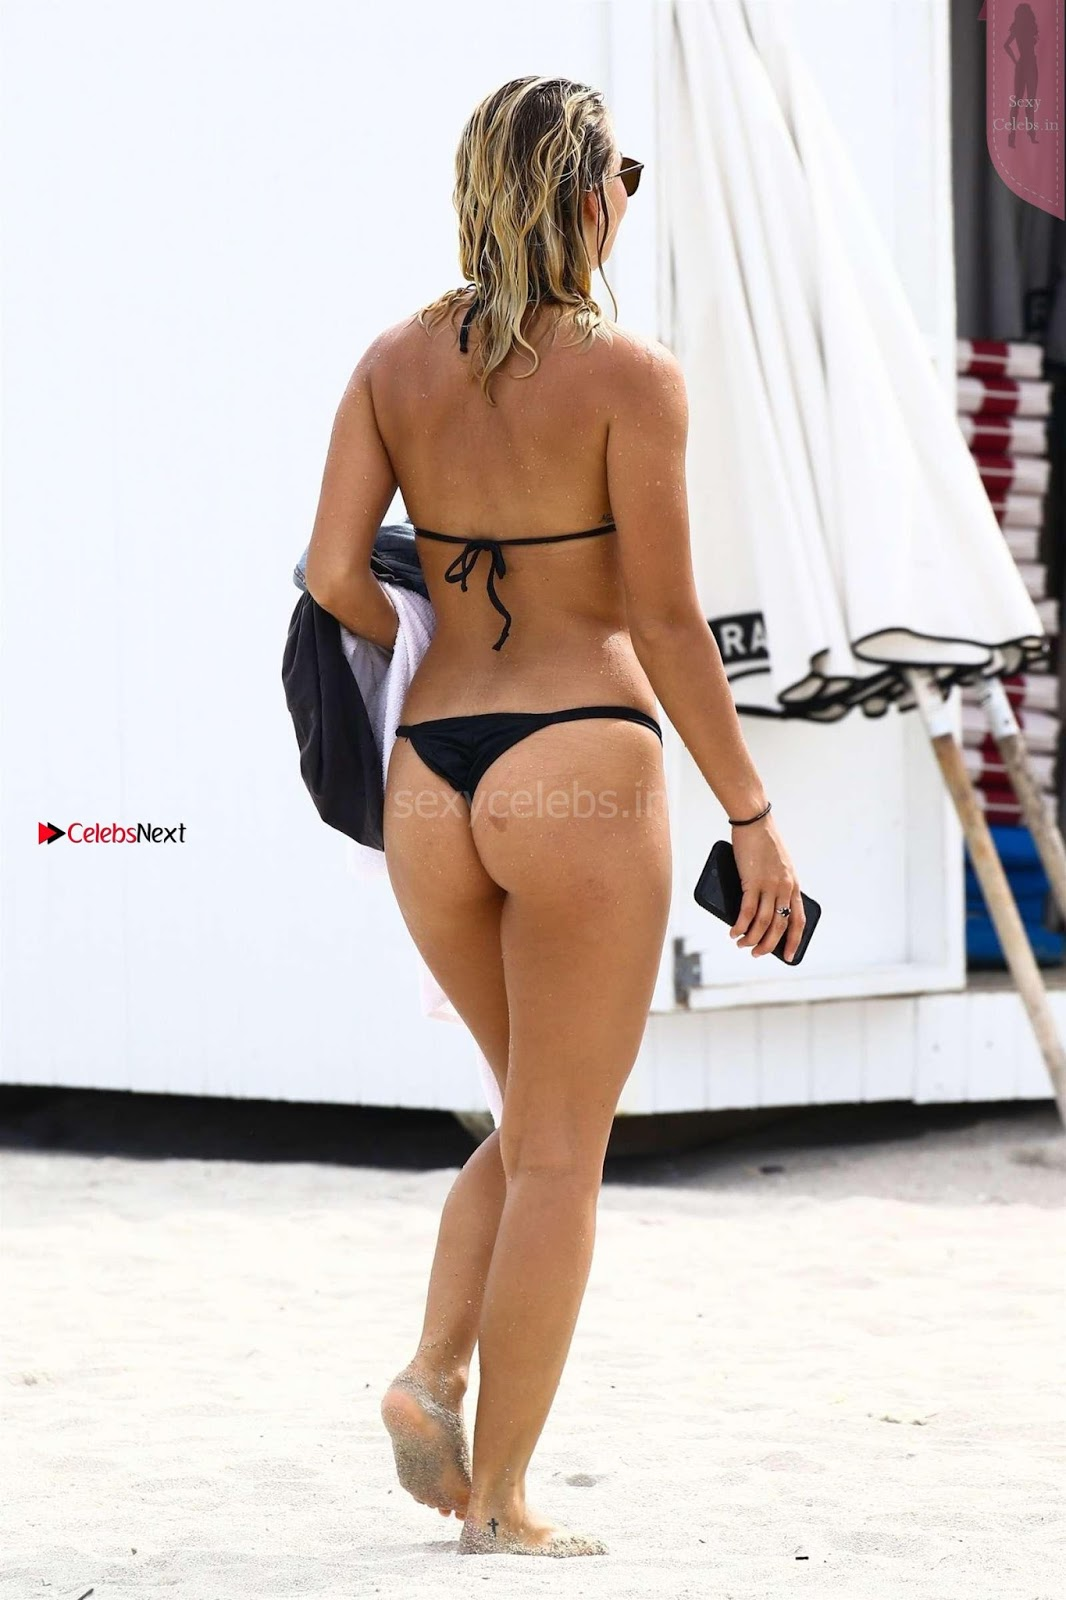 Sexy Bikini Babe Selena Webber in Black Wet Bikini Gorgeous Tits Boobs ass August 2017